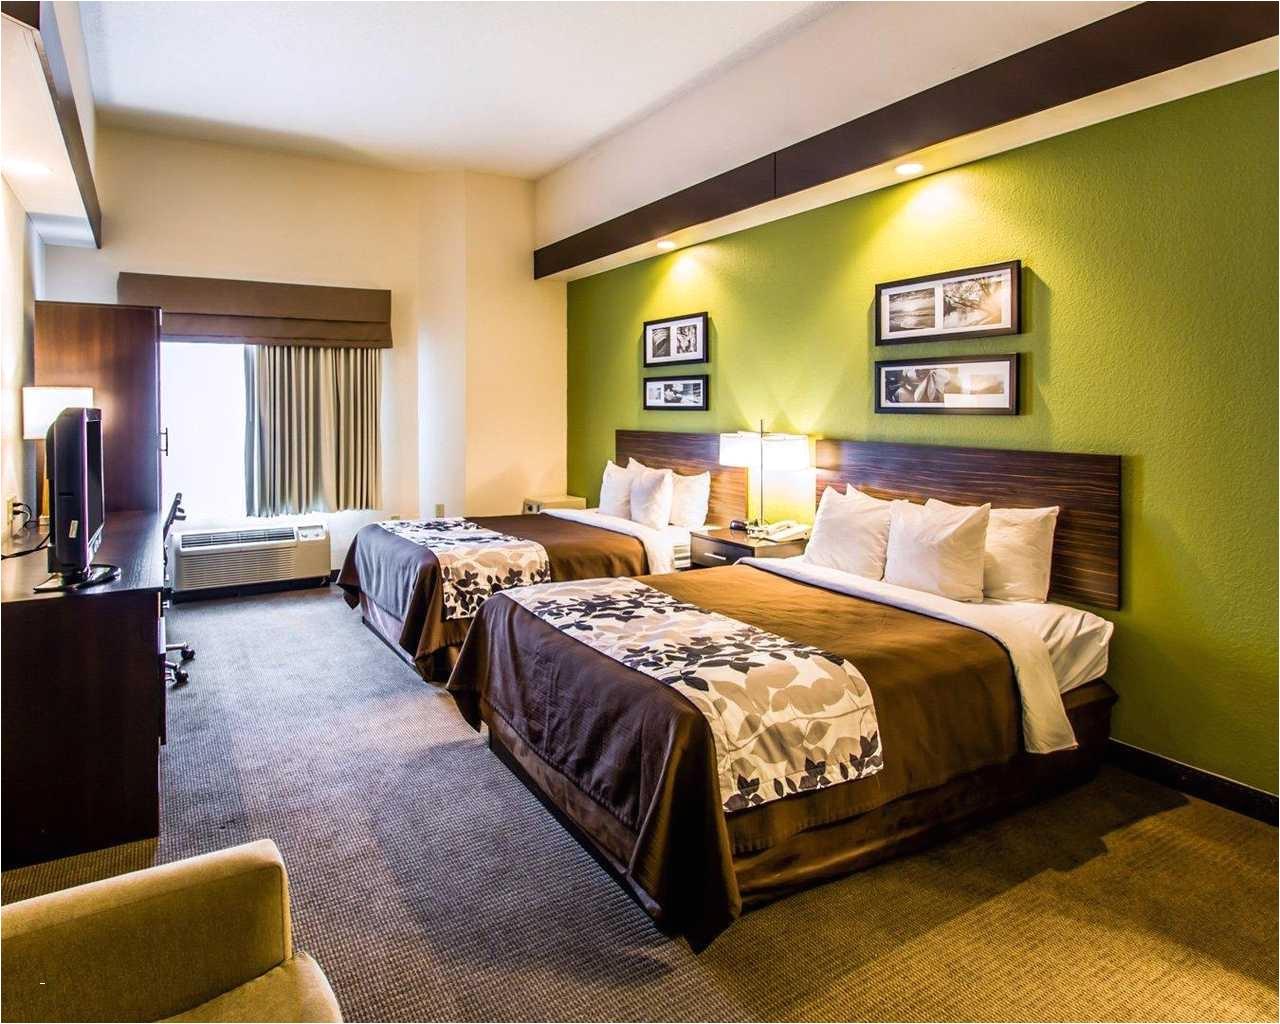 2 bedroom hotel suites international drive orlando for Orlando two bedroom suite hotels